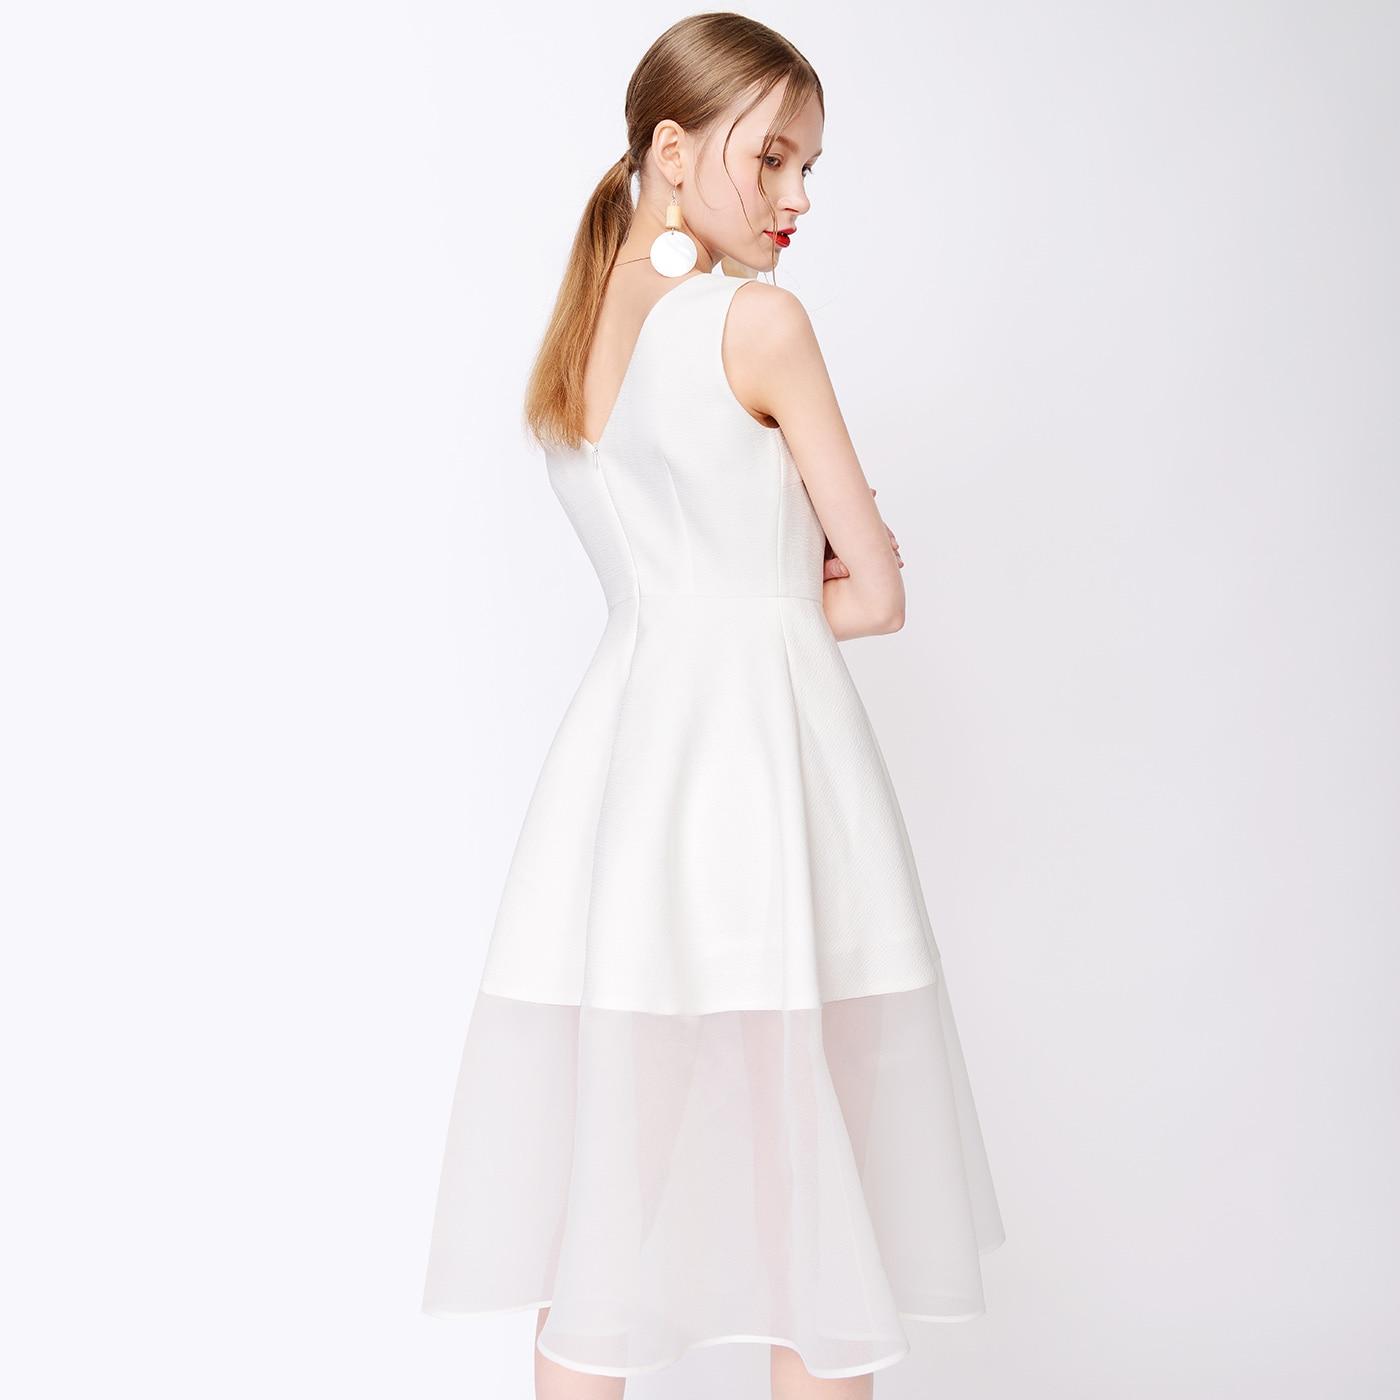 f8ece4cea139a WQJGR Summer Dress Sleeveless Women Dress O neck Party Dresses Minimalist  Vestido De Festa-in Dresses from Women's Clothing & Accessories on ...